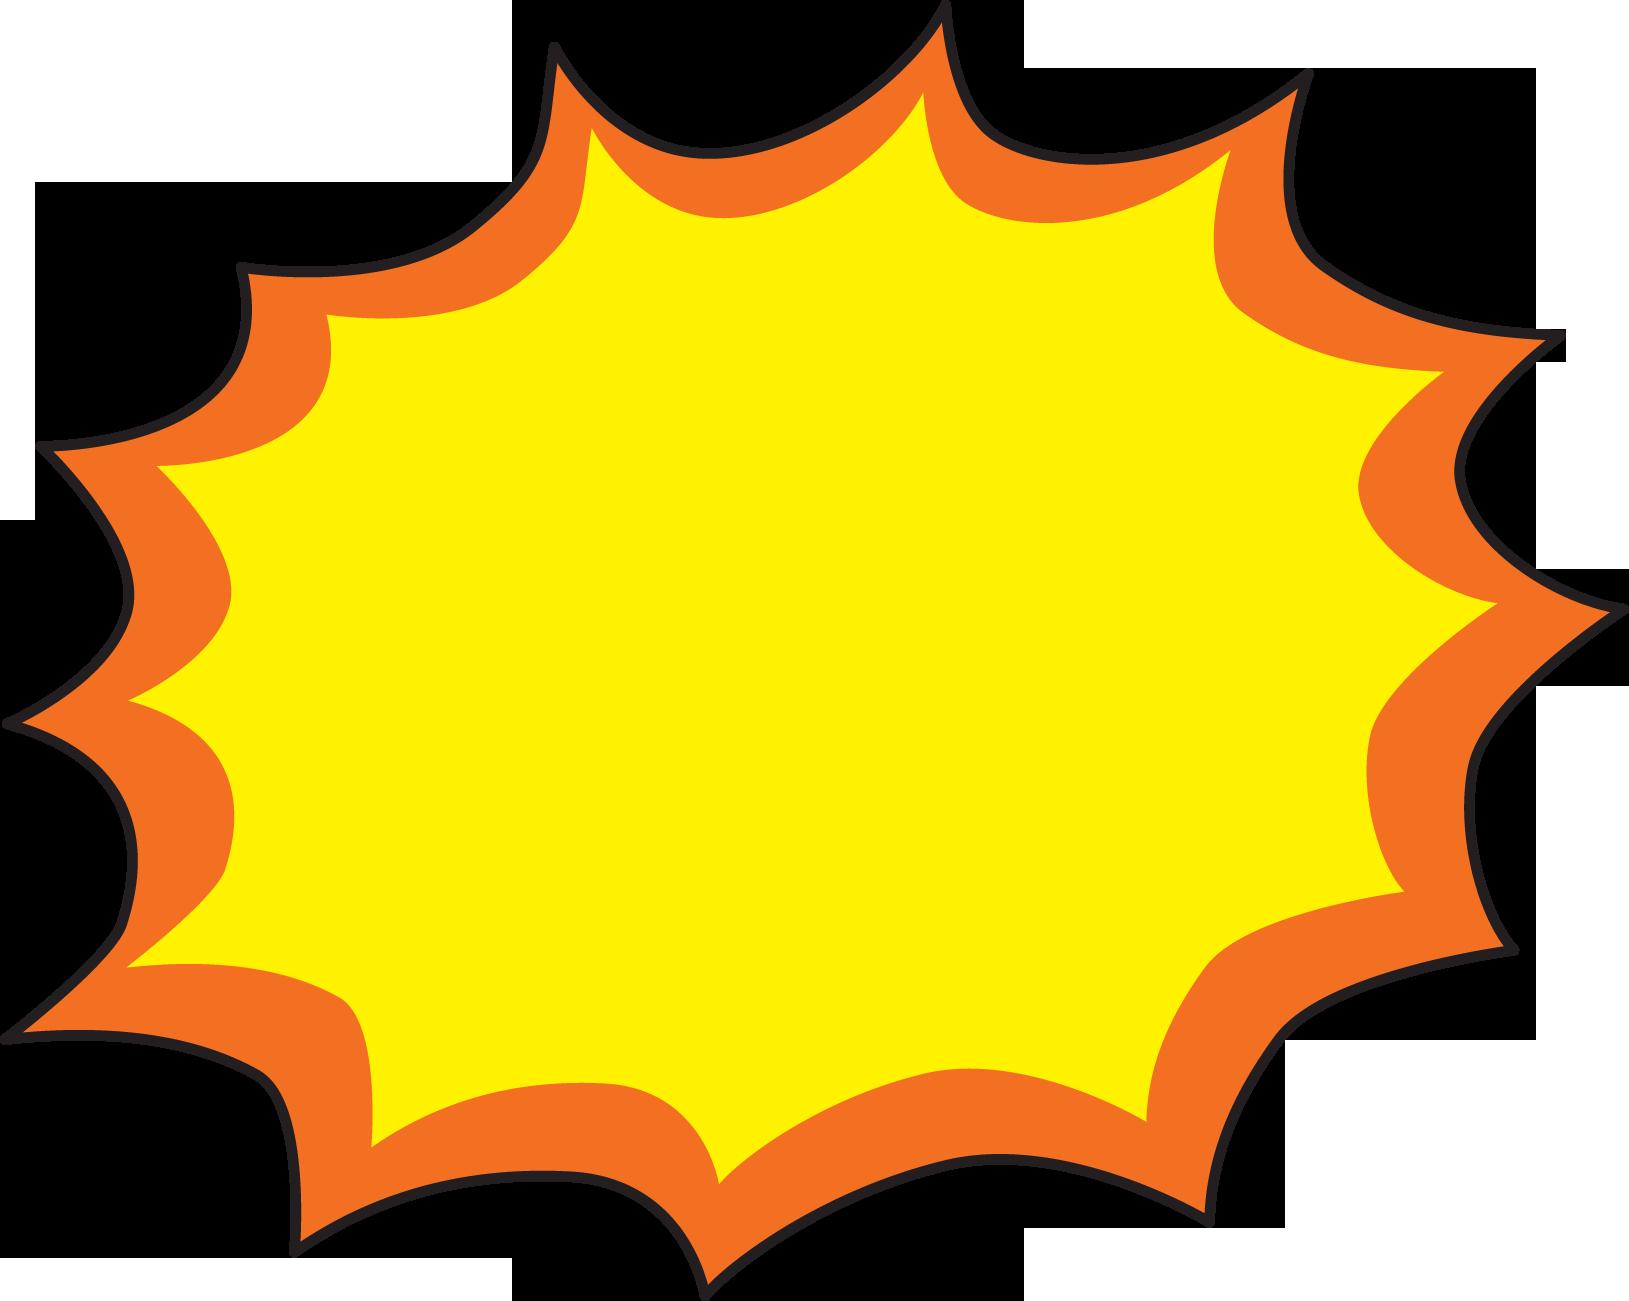 Clipart Explosion-clipart explosion-1